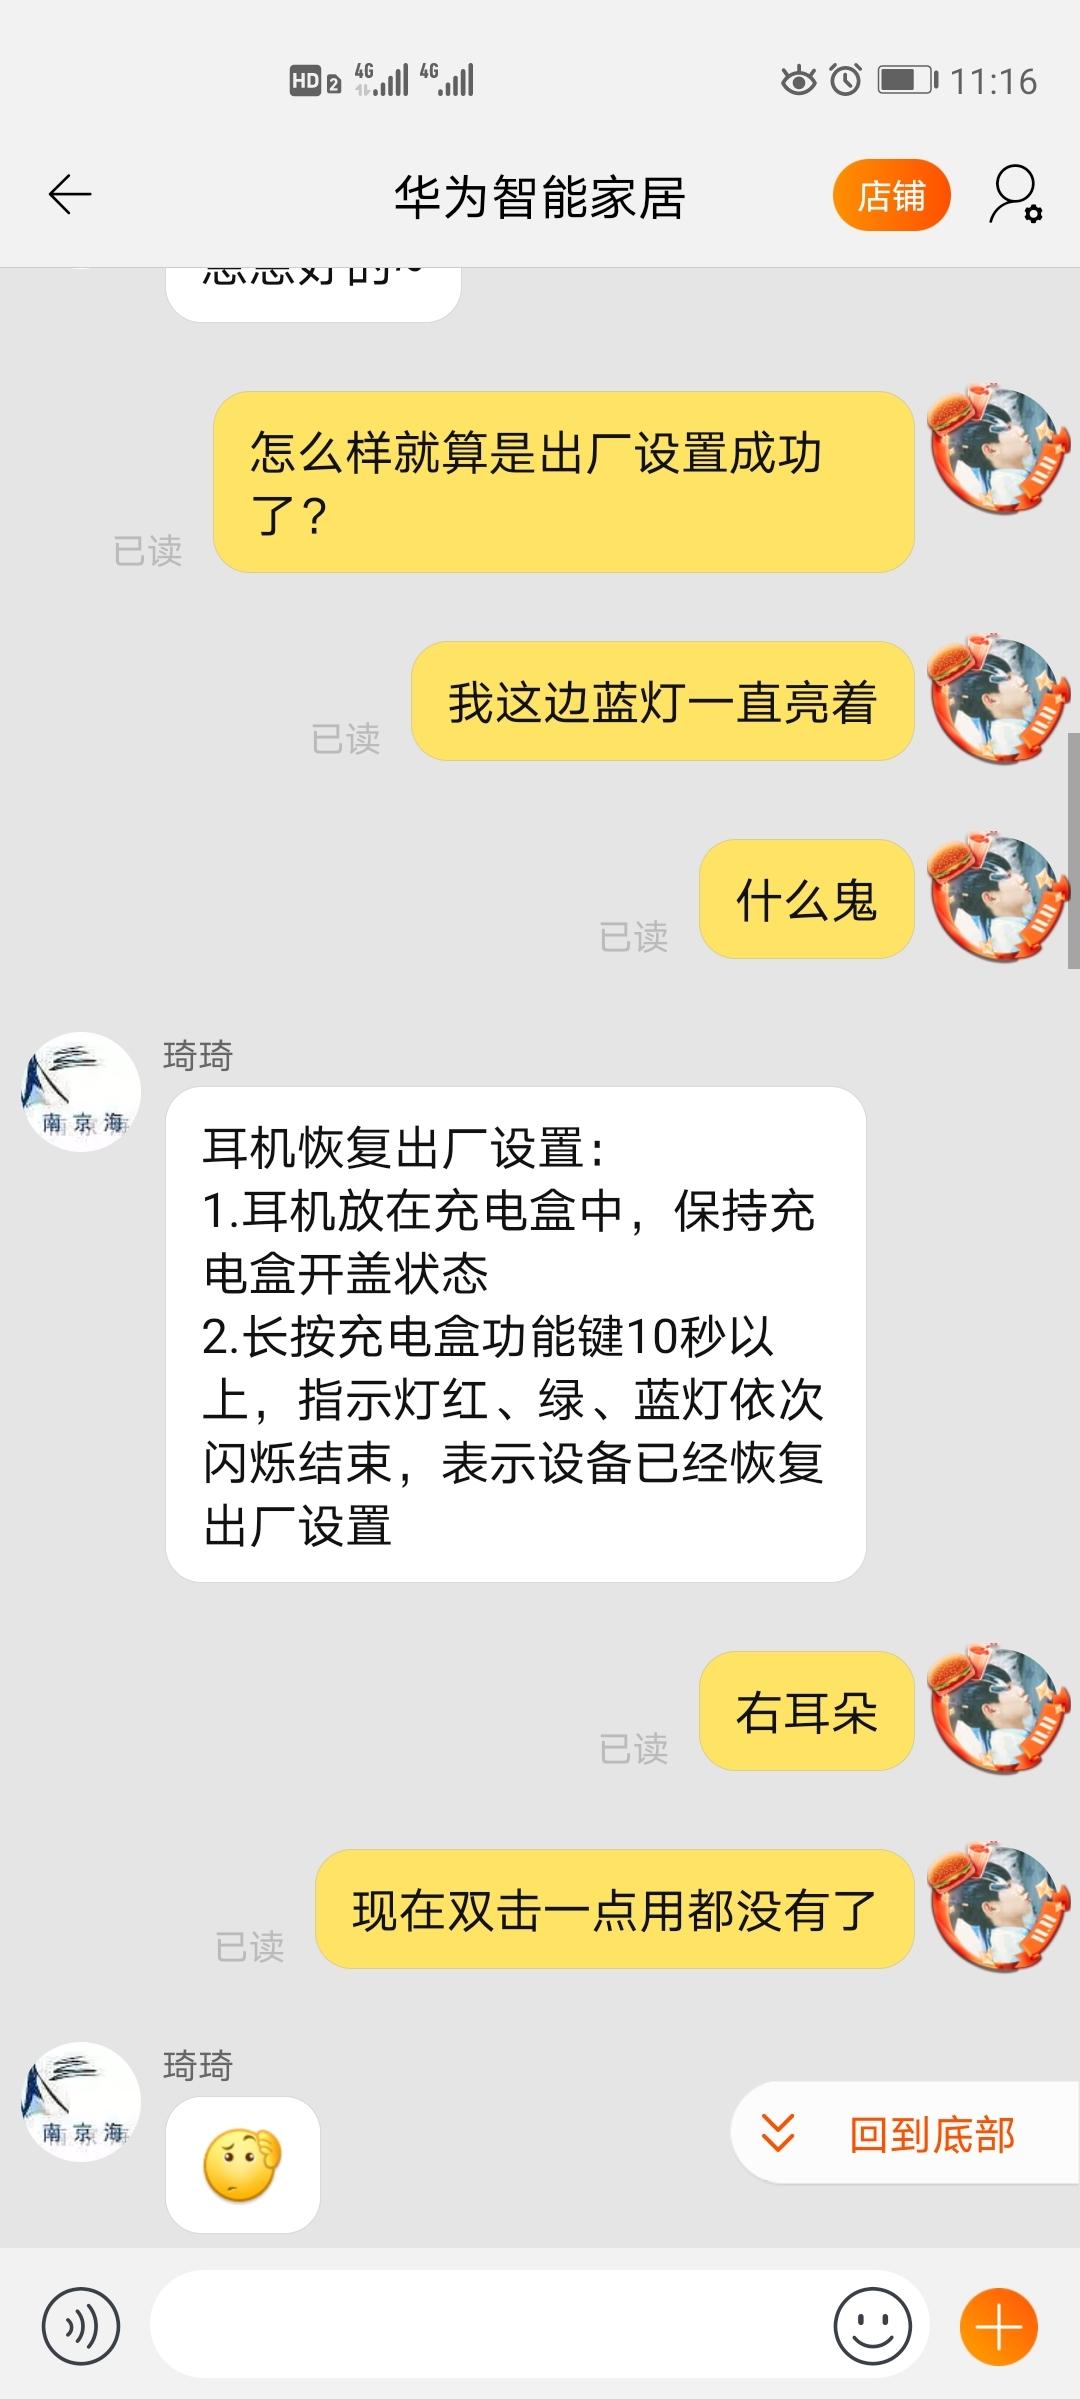 Screenshot_20200508_111648_com.taobao.taobao.jpg